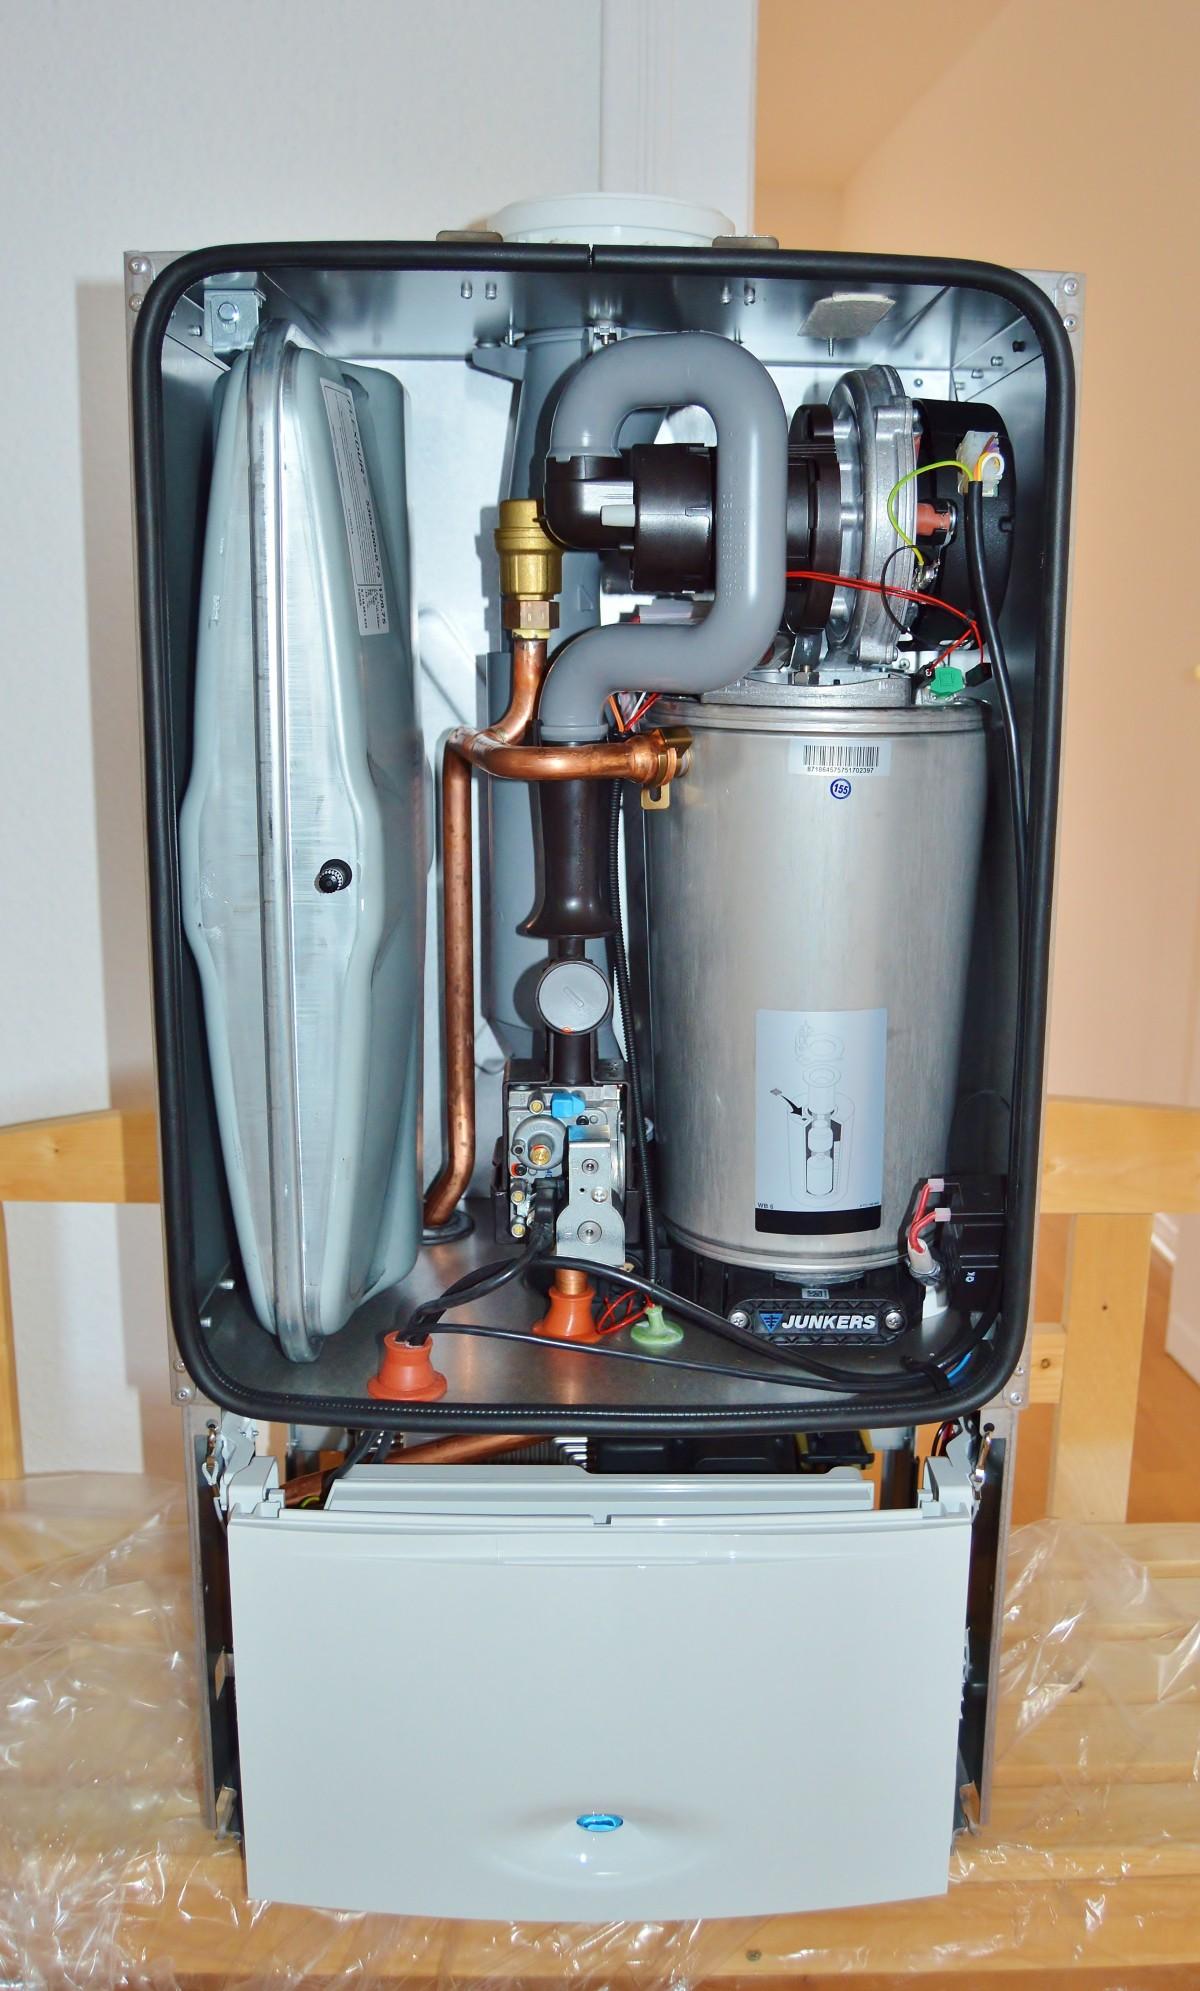 Changer resistance chauffe eau changer resistance chauffe eau with changer resistance chauffe - Changer groupe securite chauffe eau ...